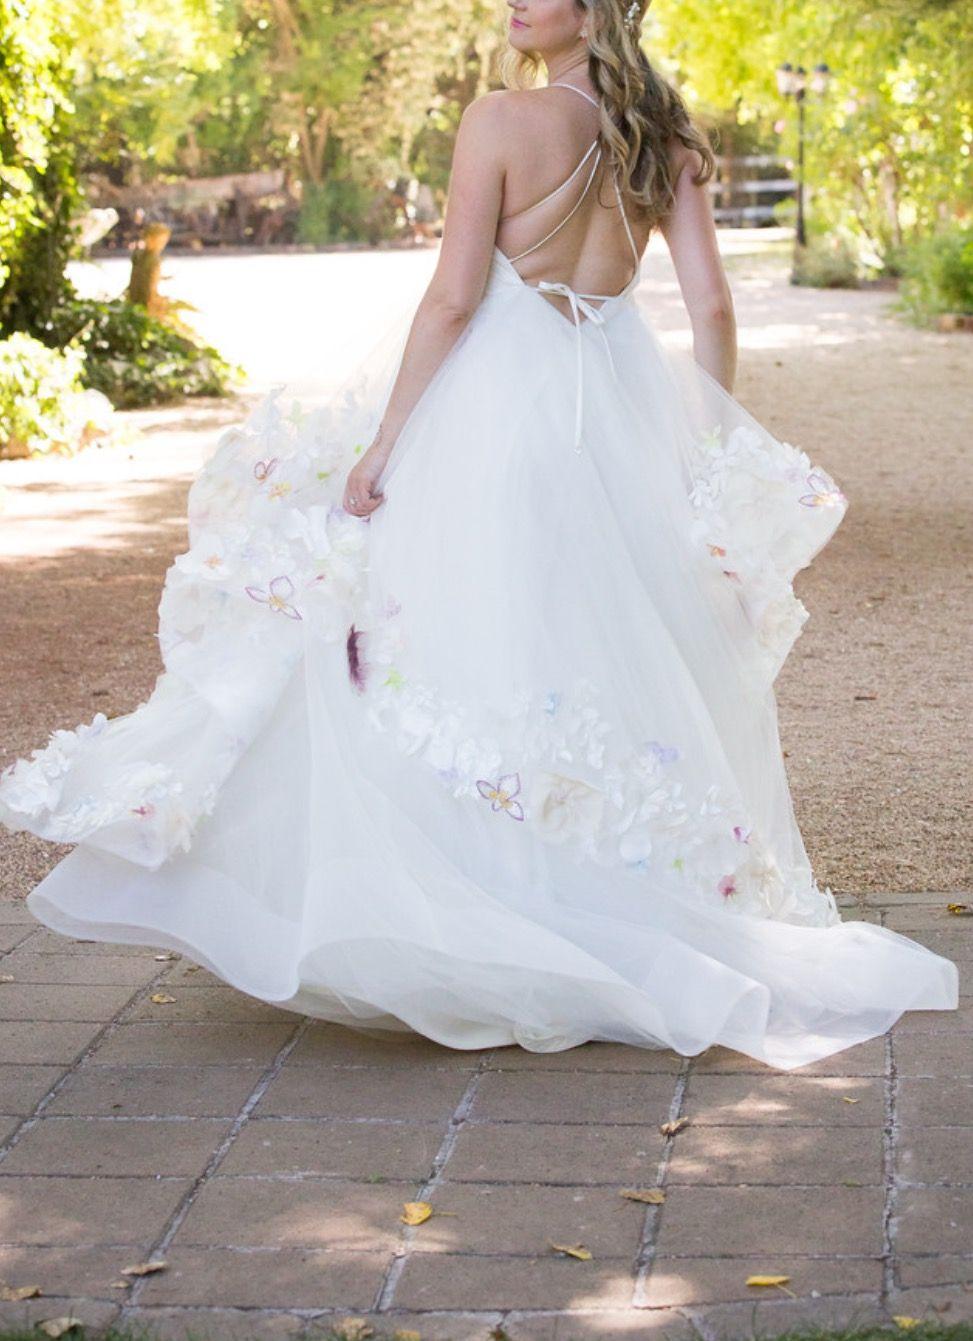 Hayley Paige Empire Waist 6601 Wedding Dress Used, Size